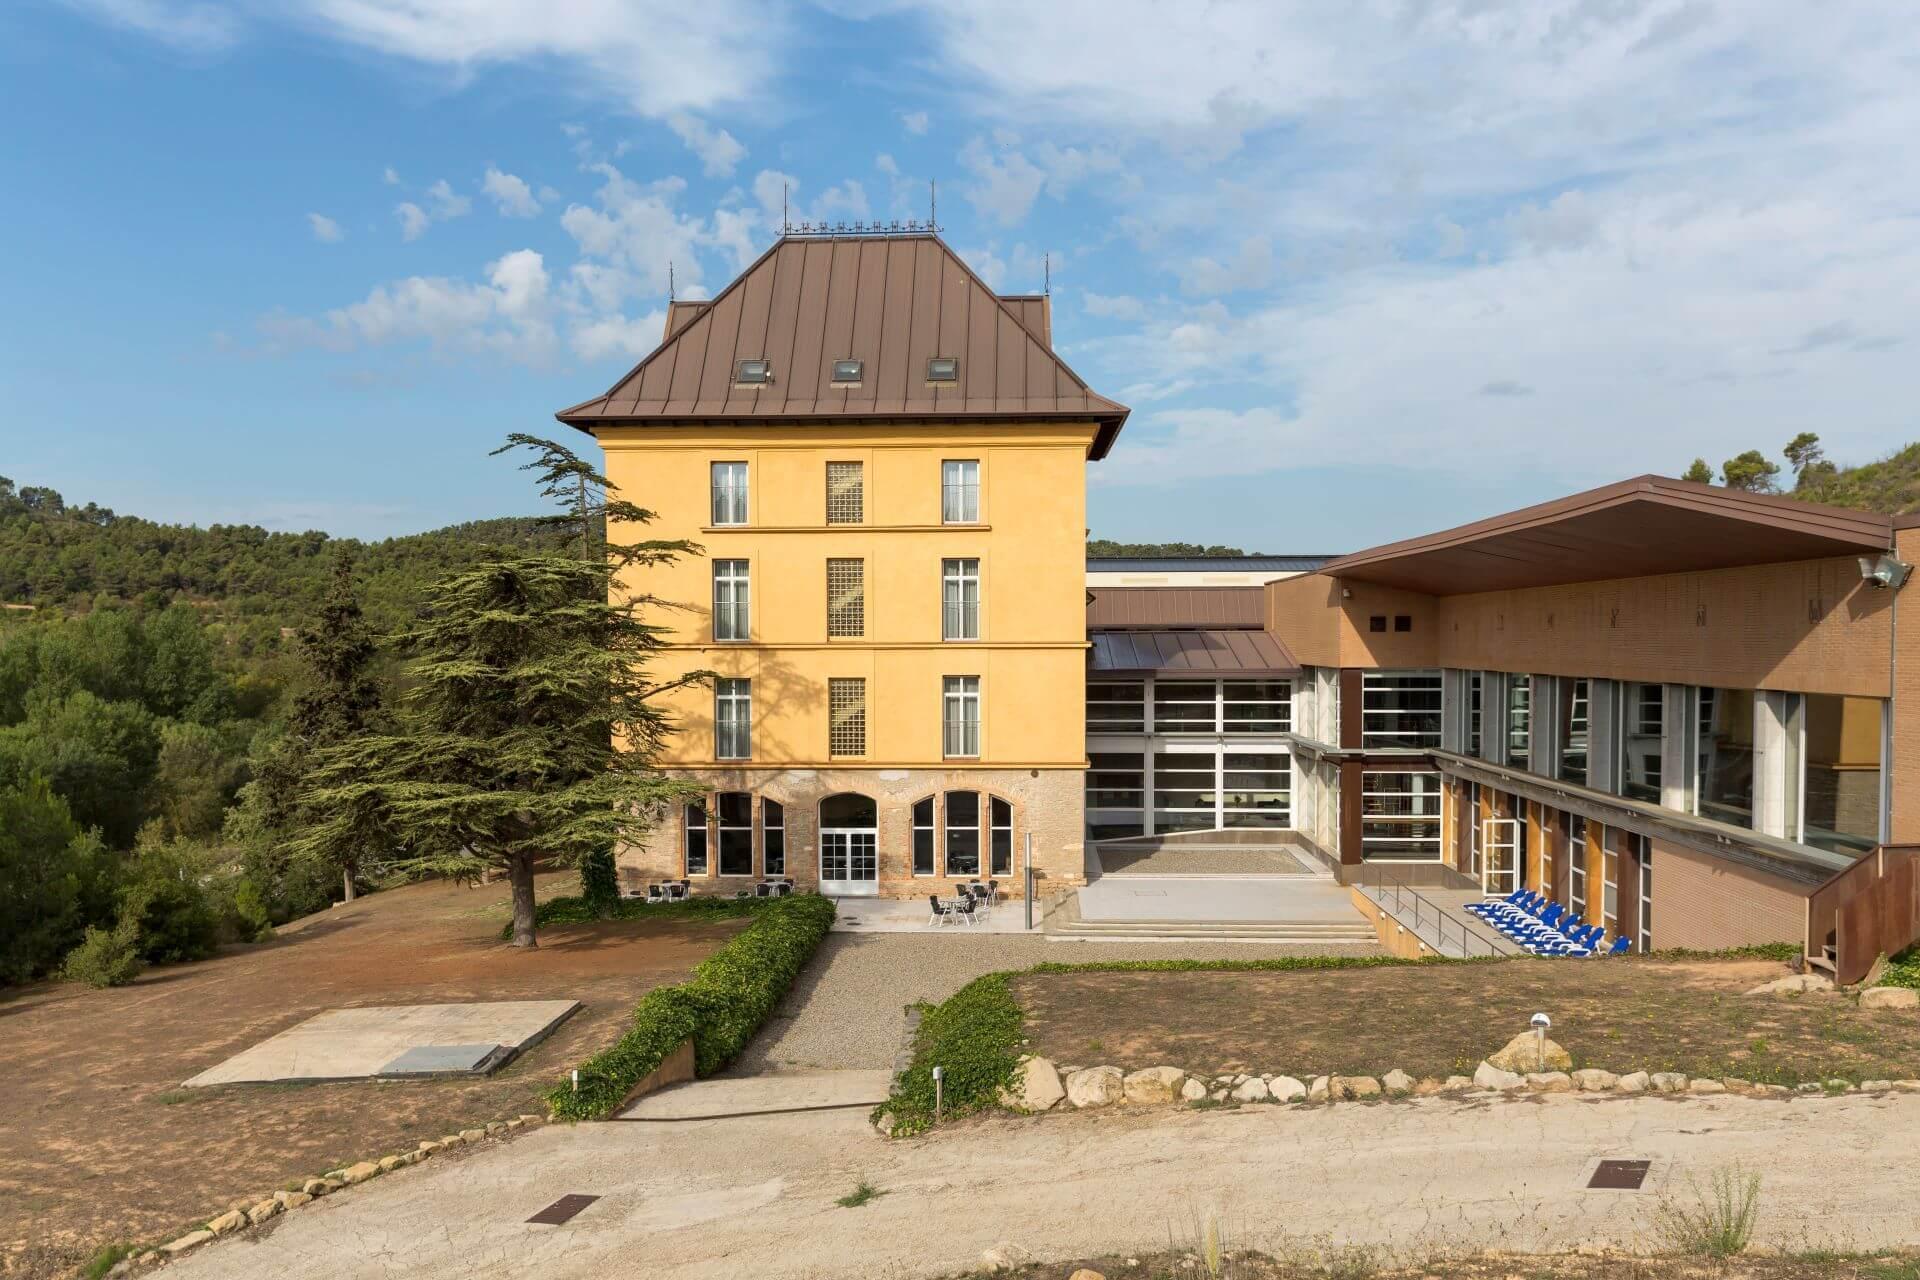 https://iberikhoteles.com//resources/hotels/rocallaura/fotos-nuevas/iberik-rocallaura-620.jpg